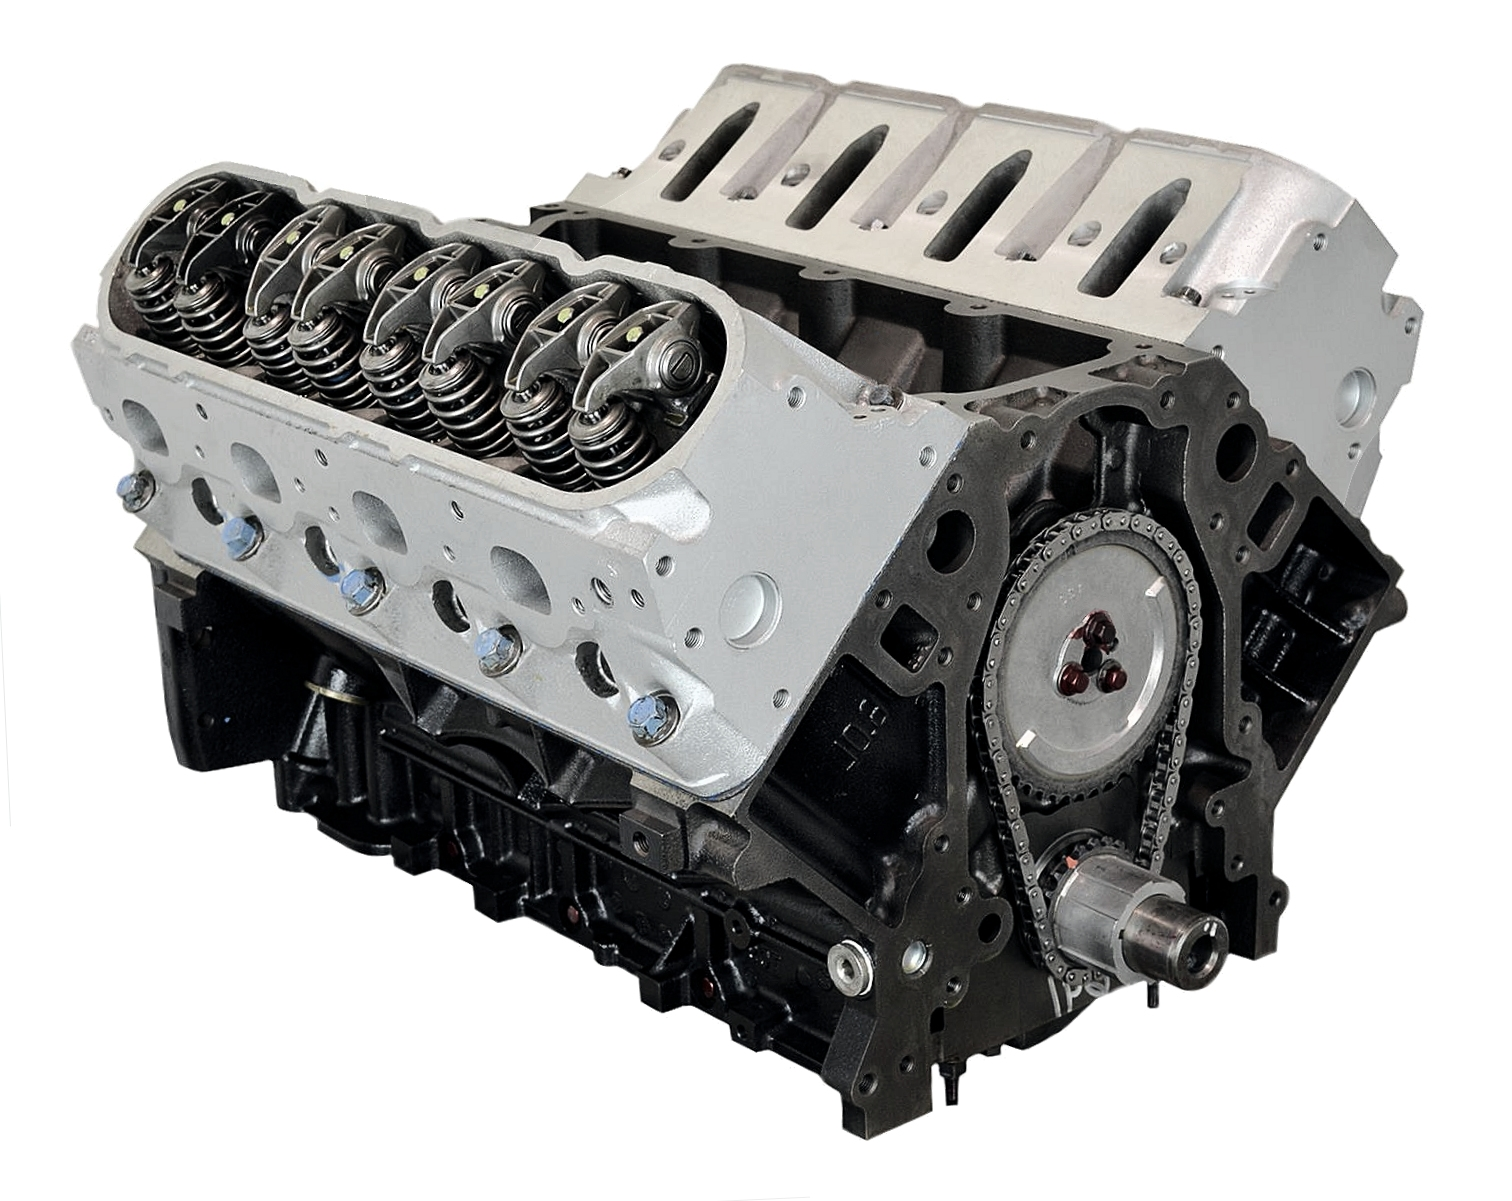 Chevrolet Express 1500 - 5.3 LM7 Engine - 2003-2007 (Vin Code: T)